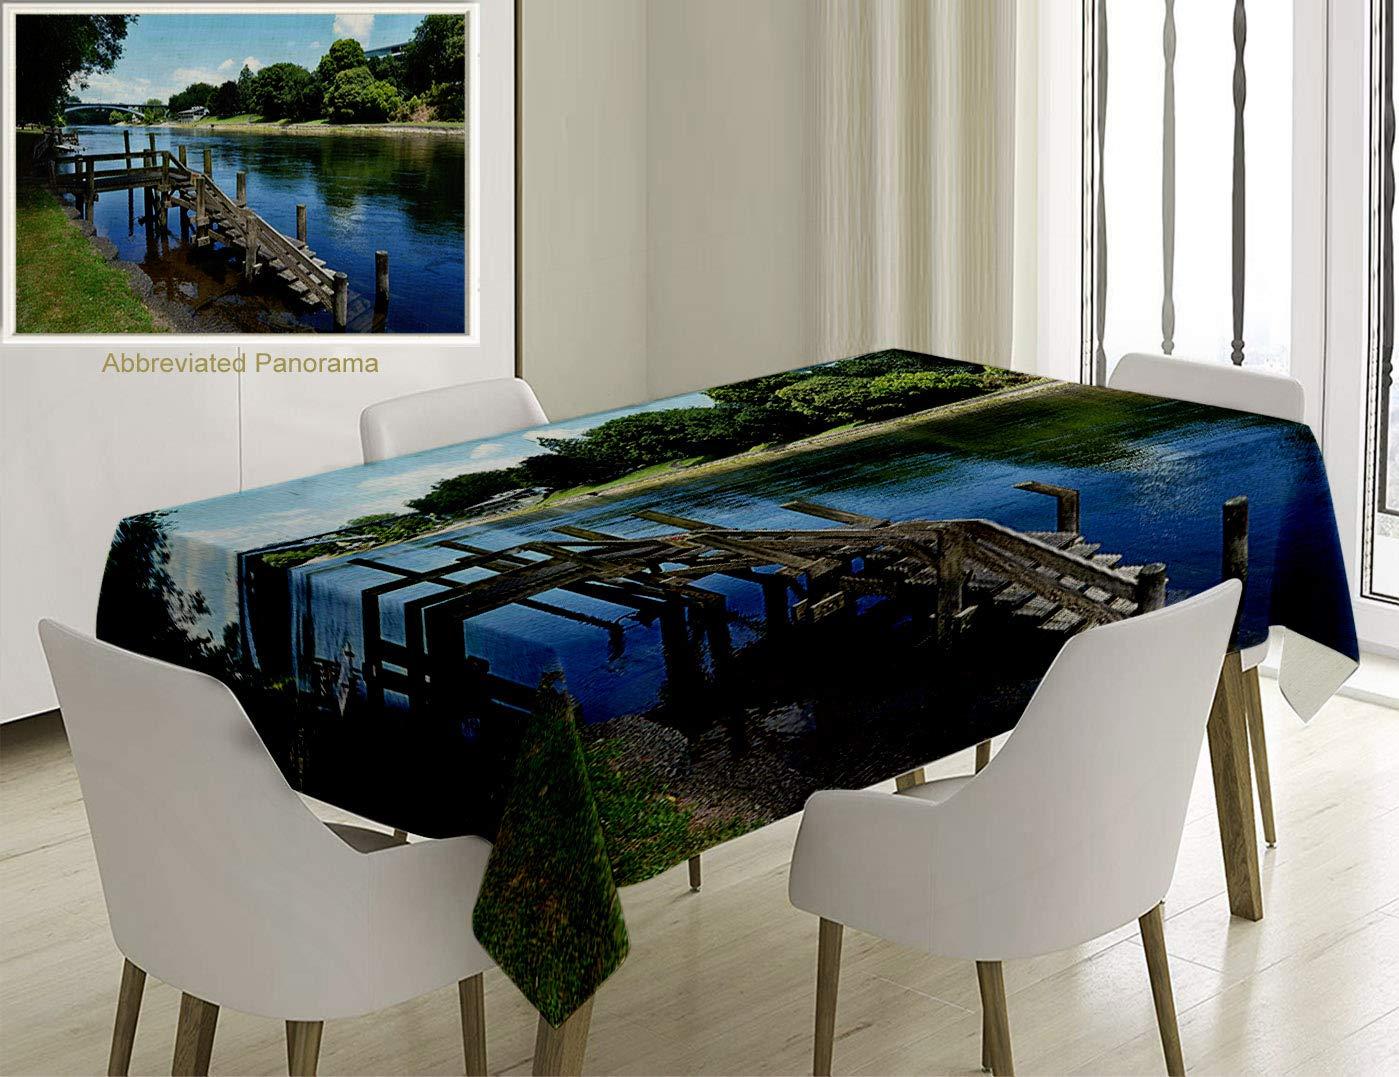 Outdoor waikato river hamilton city new zealand holiday destination travel landmark green blue greytablecovers for rectangle tables 78 x 54 inches